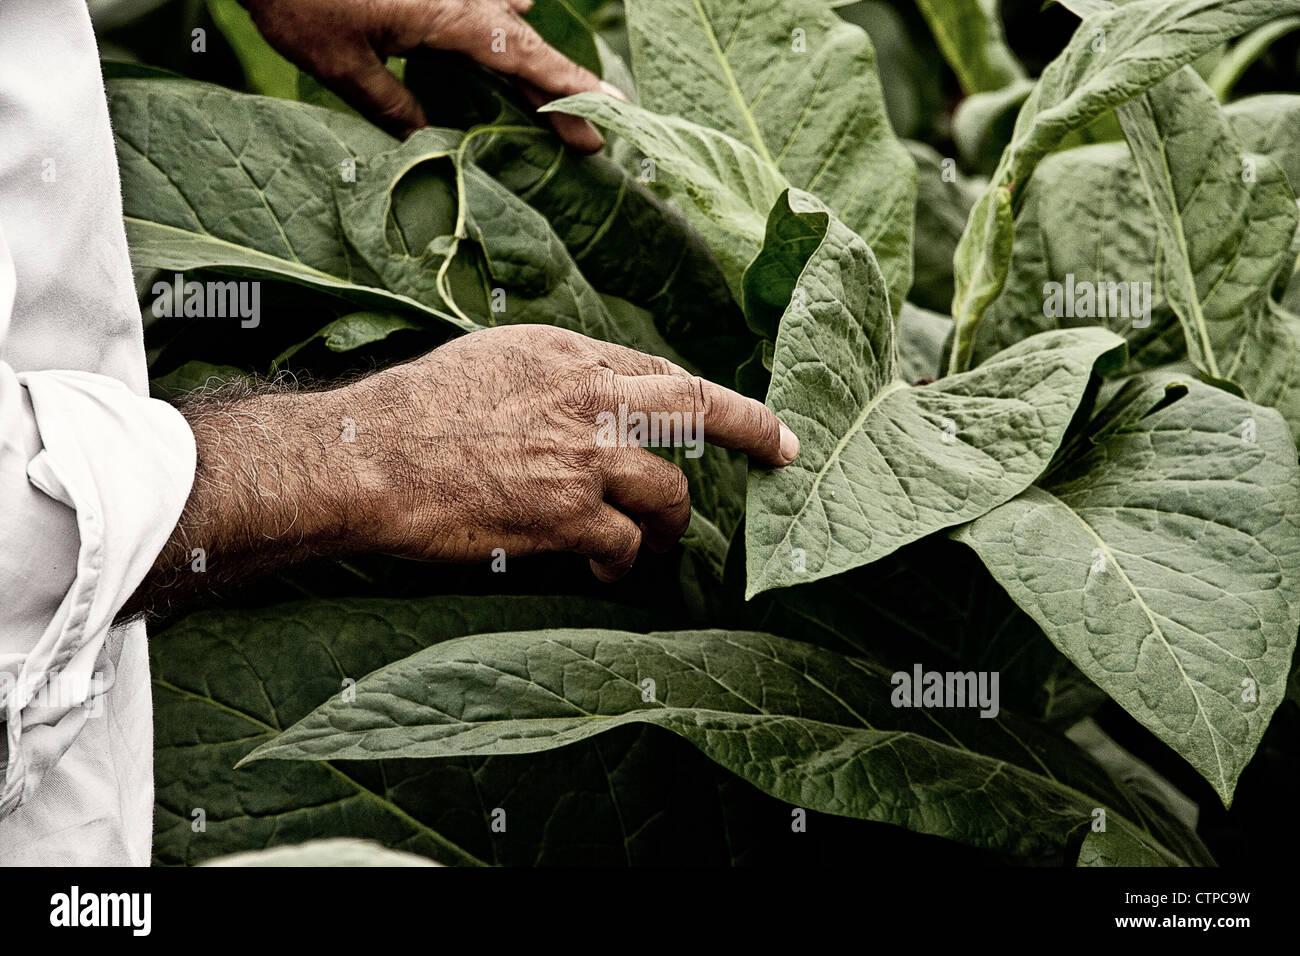 Tobacco worker explaining tobacco leaf morphology. - Stock Image